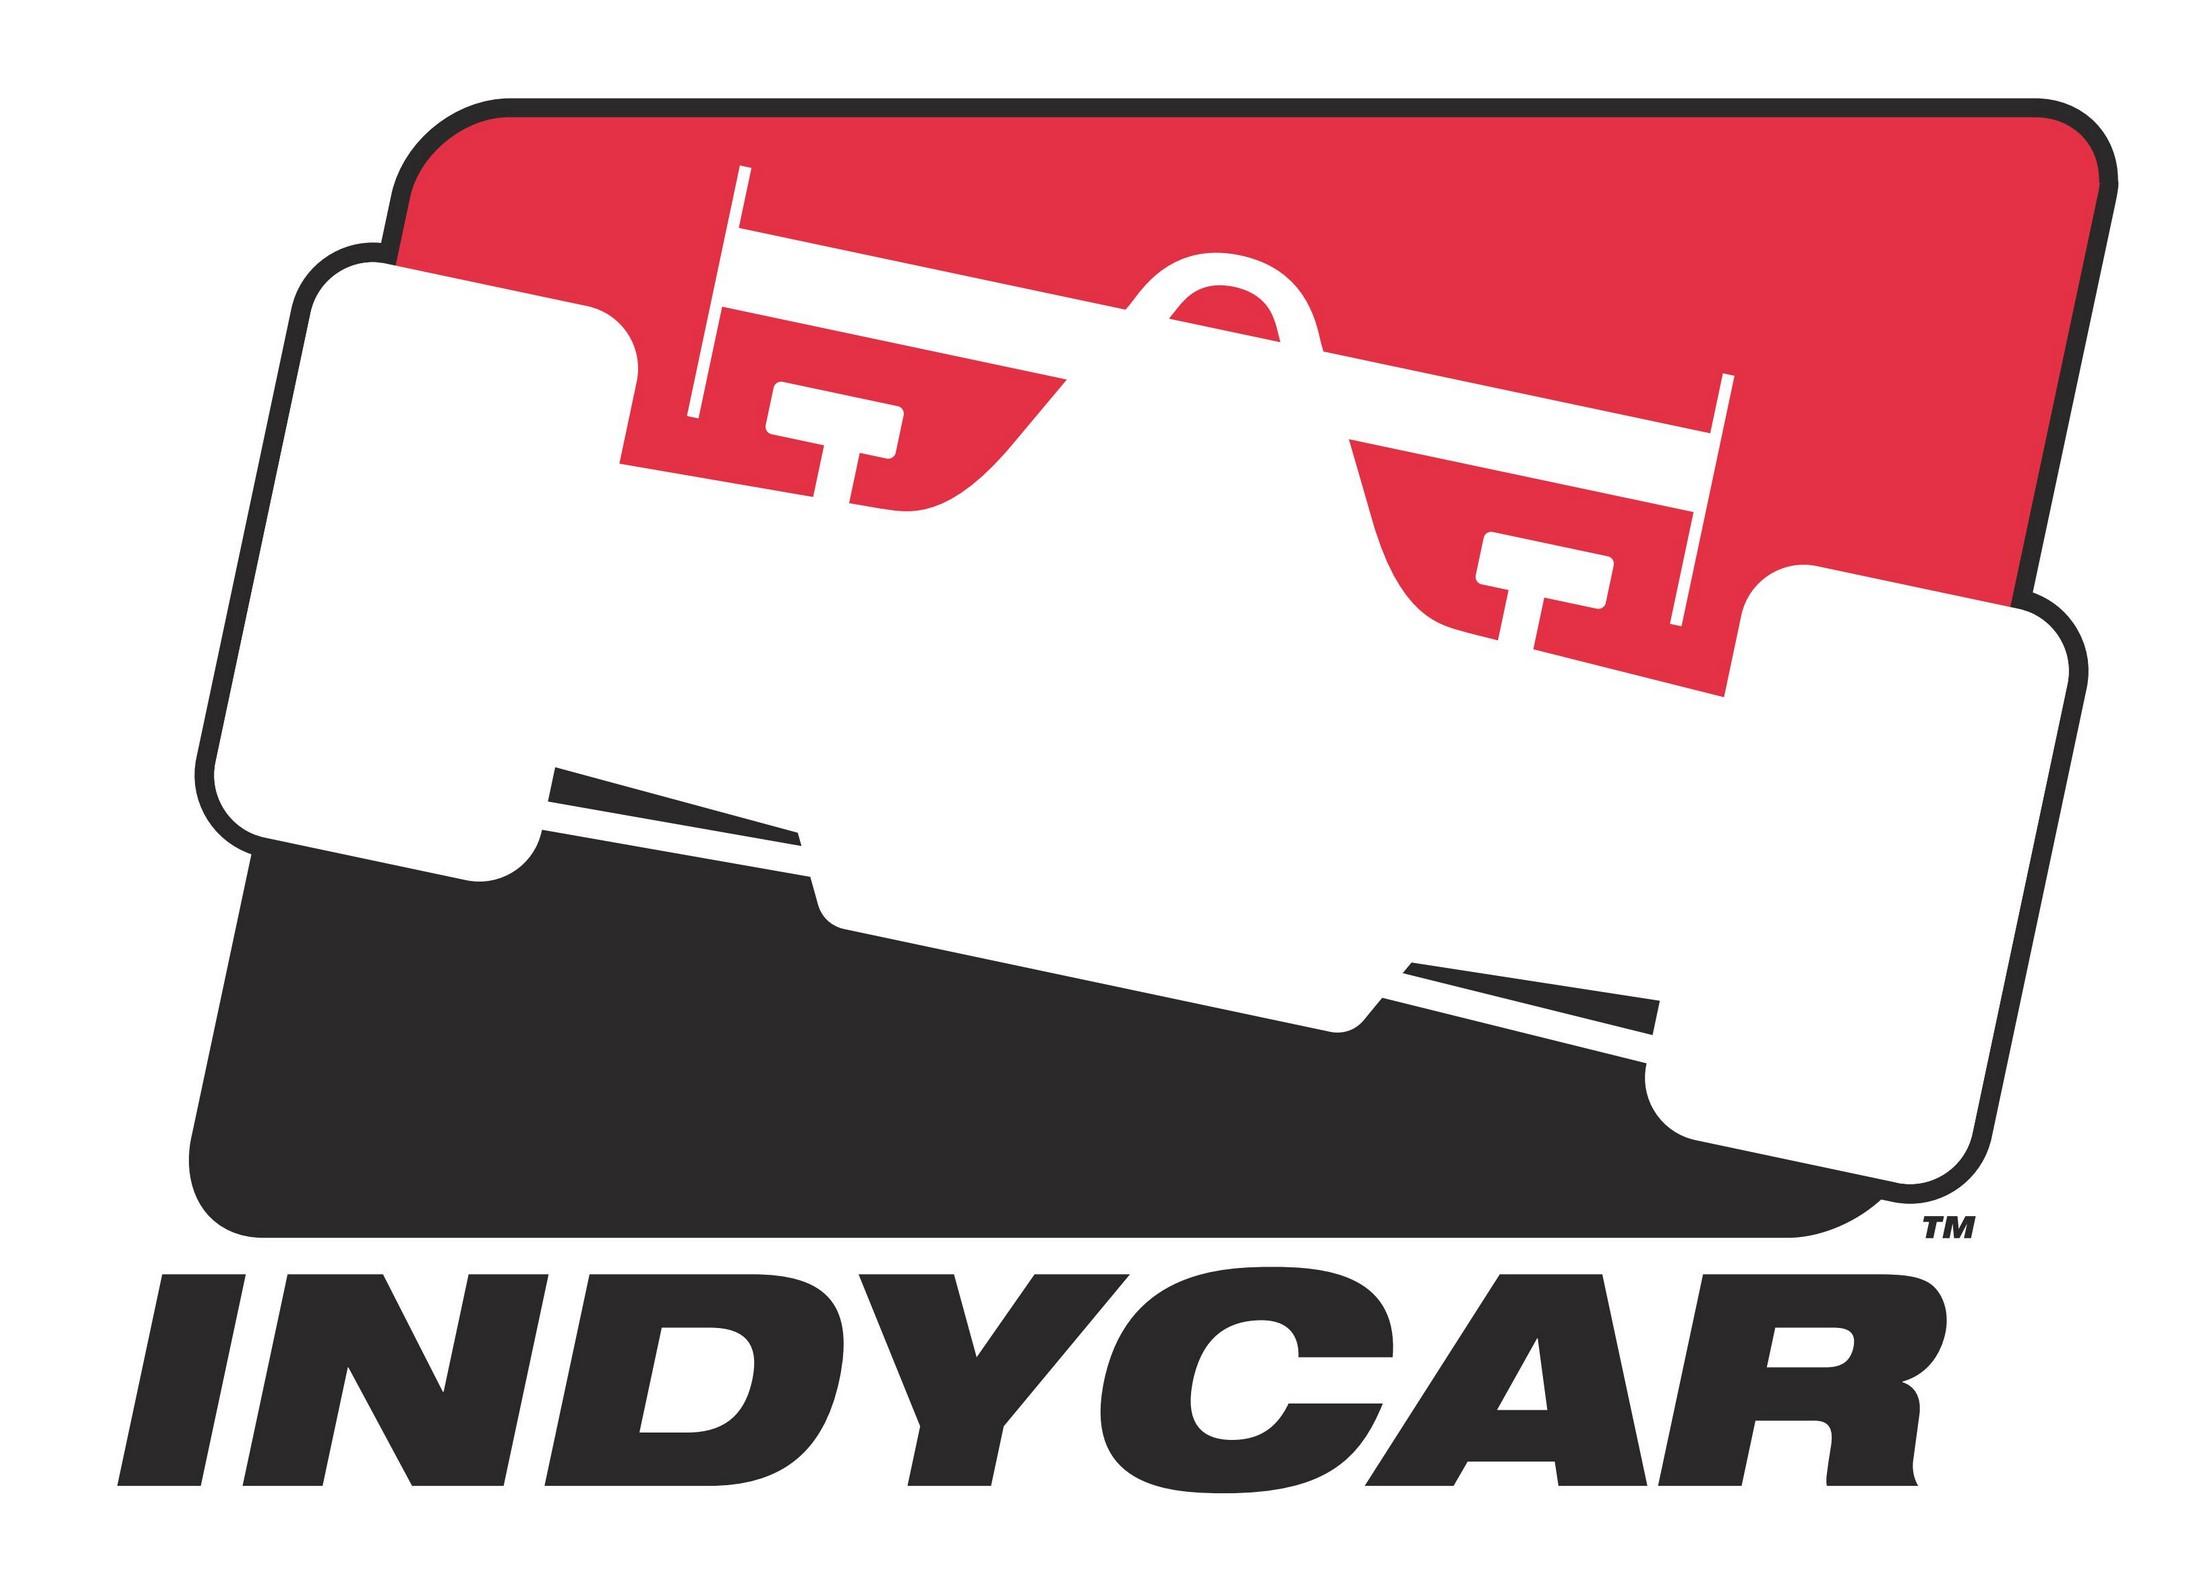 Yamaha clipart motor racing & car auto IndyCar 126